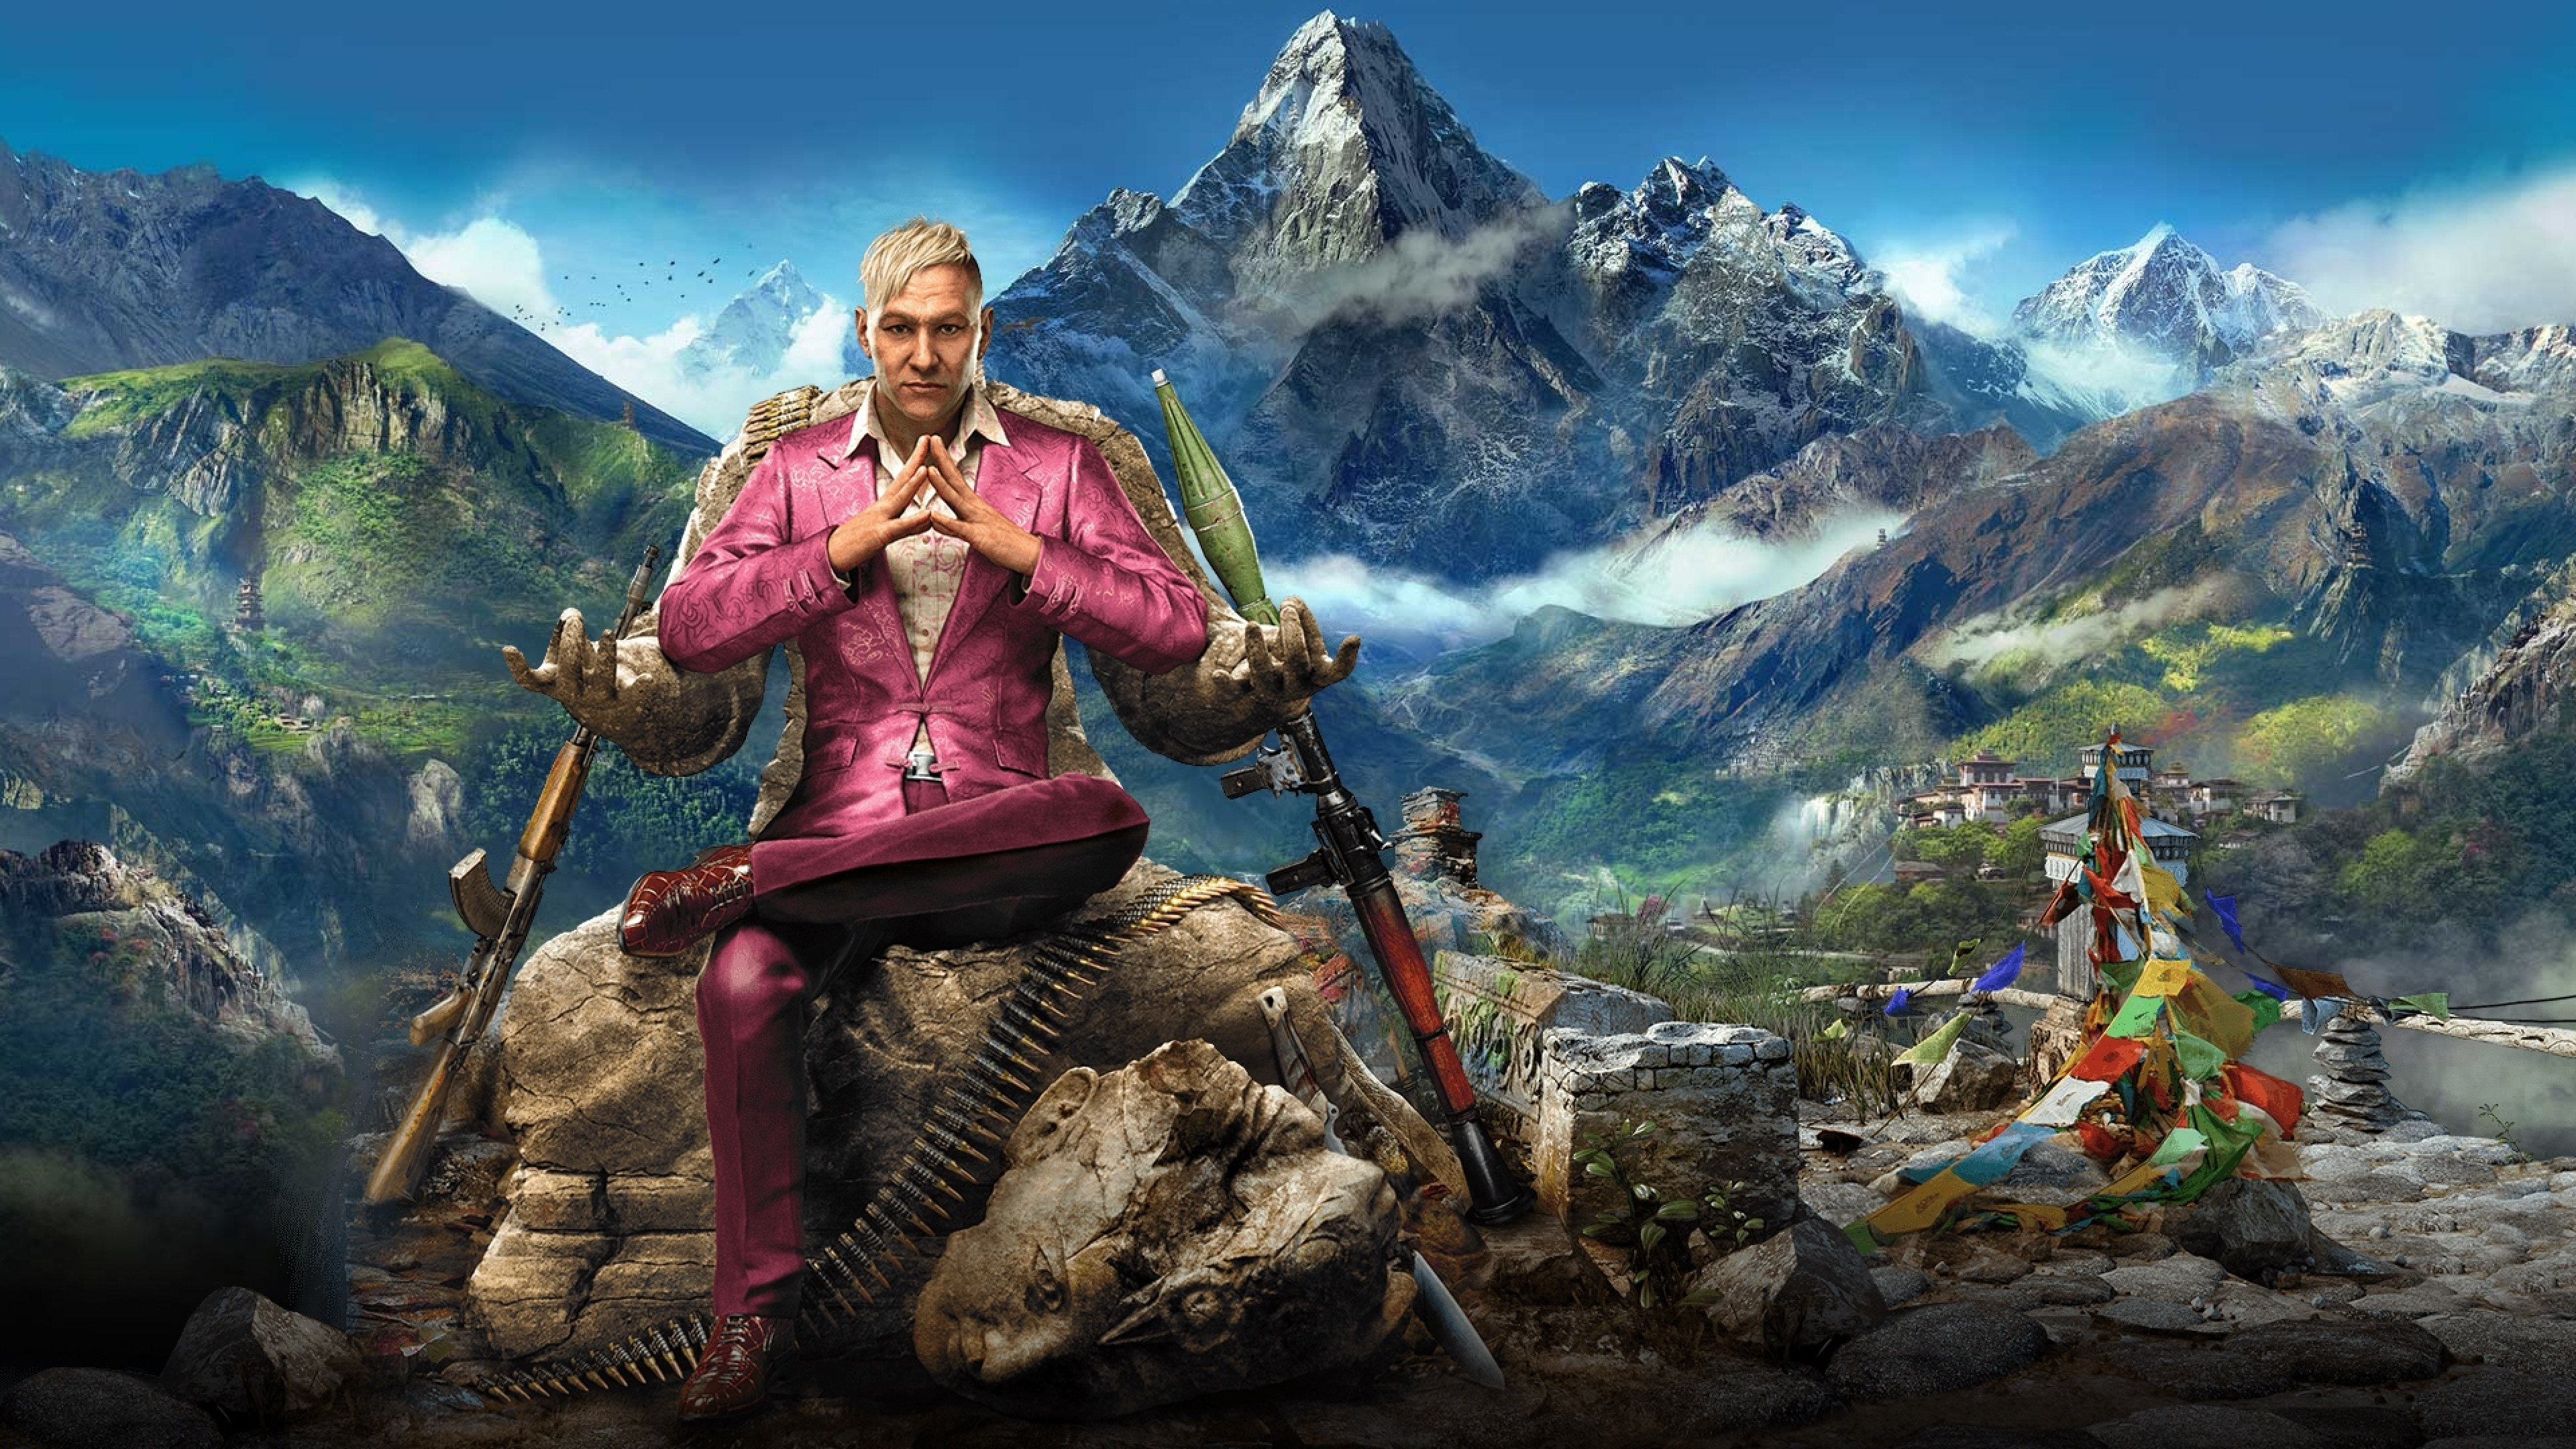 Far Cry 4 Wallpaper: Far Cry 4 4K Wallpaper